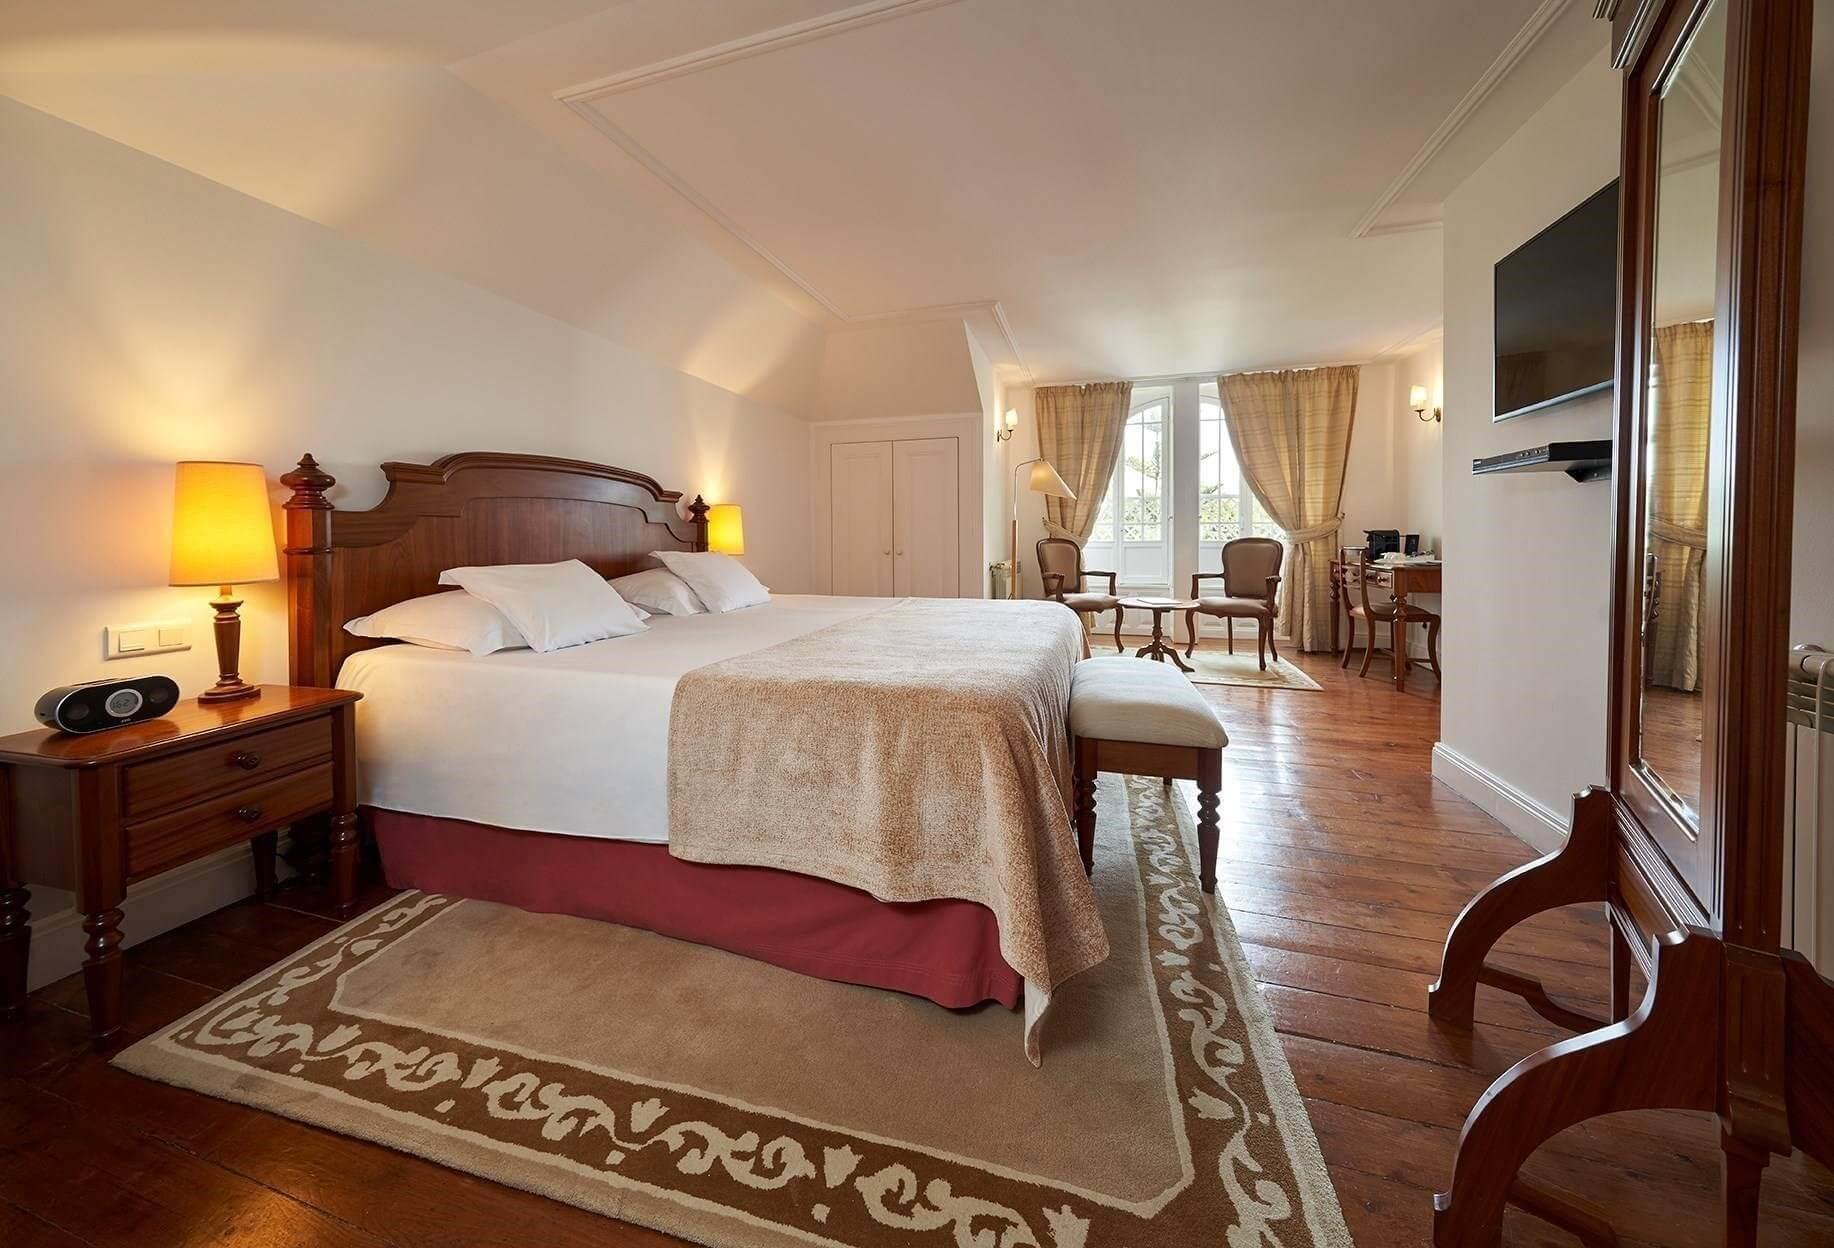 Hotel PortoBay Serra Golf - Madeira Island - Superior Room